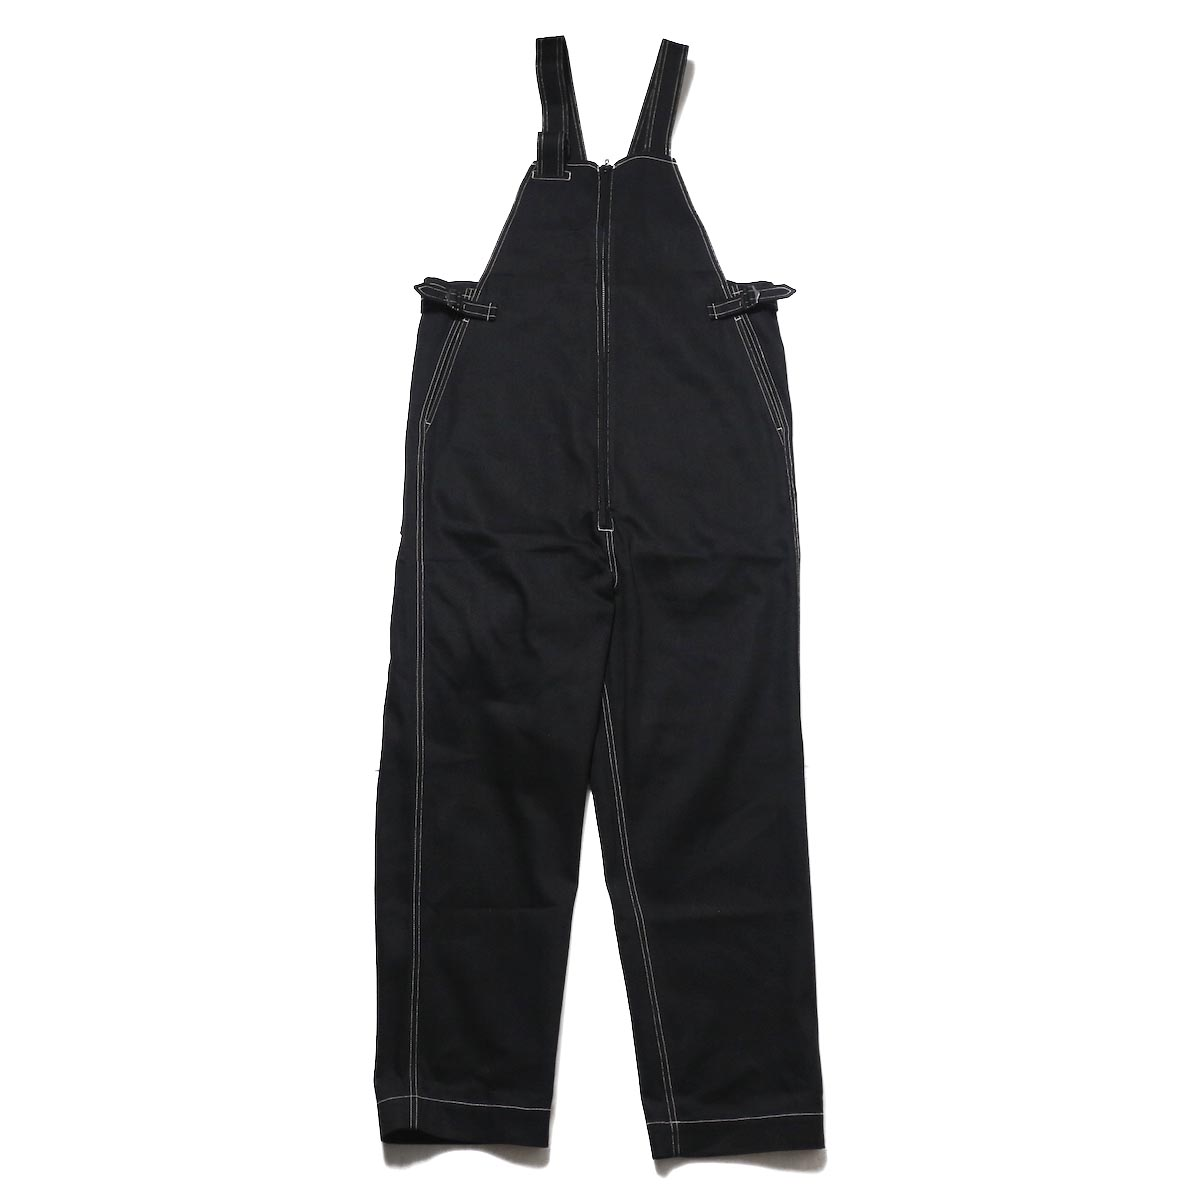 blurhms / U.S Cotton Denim Overalls (Black)正面